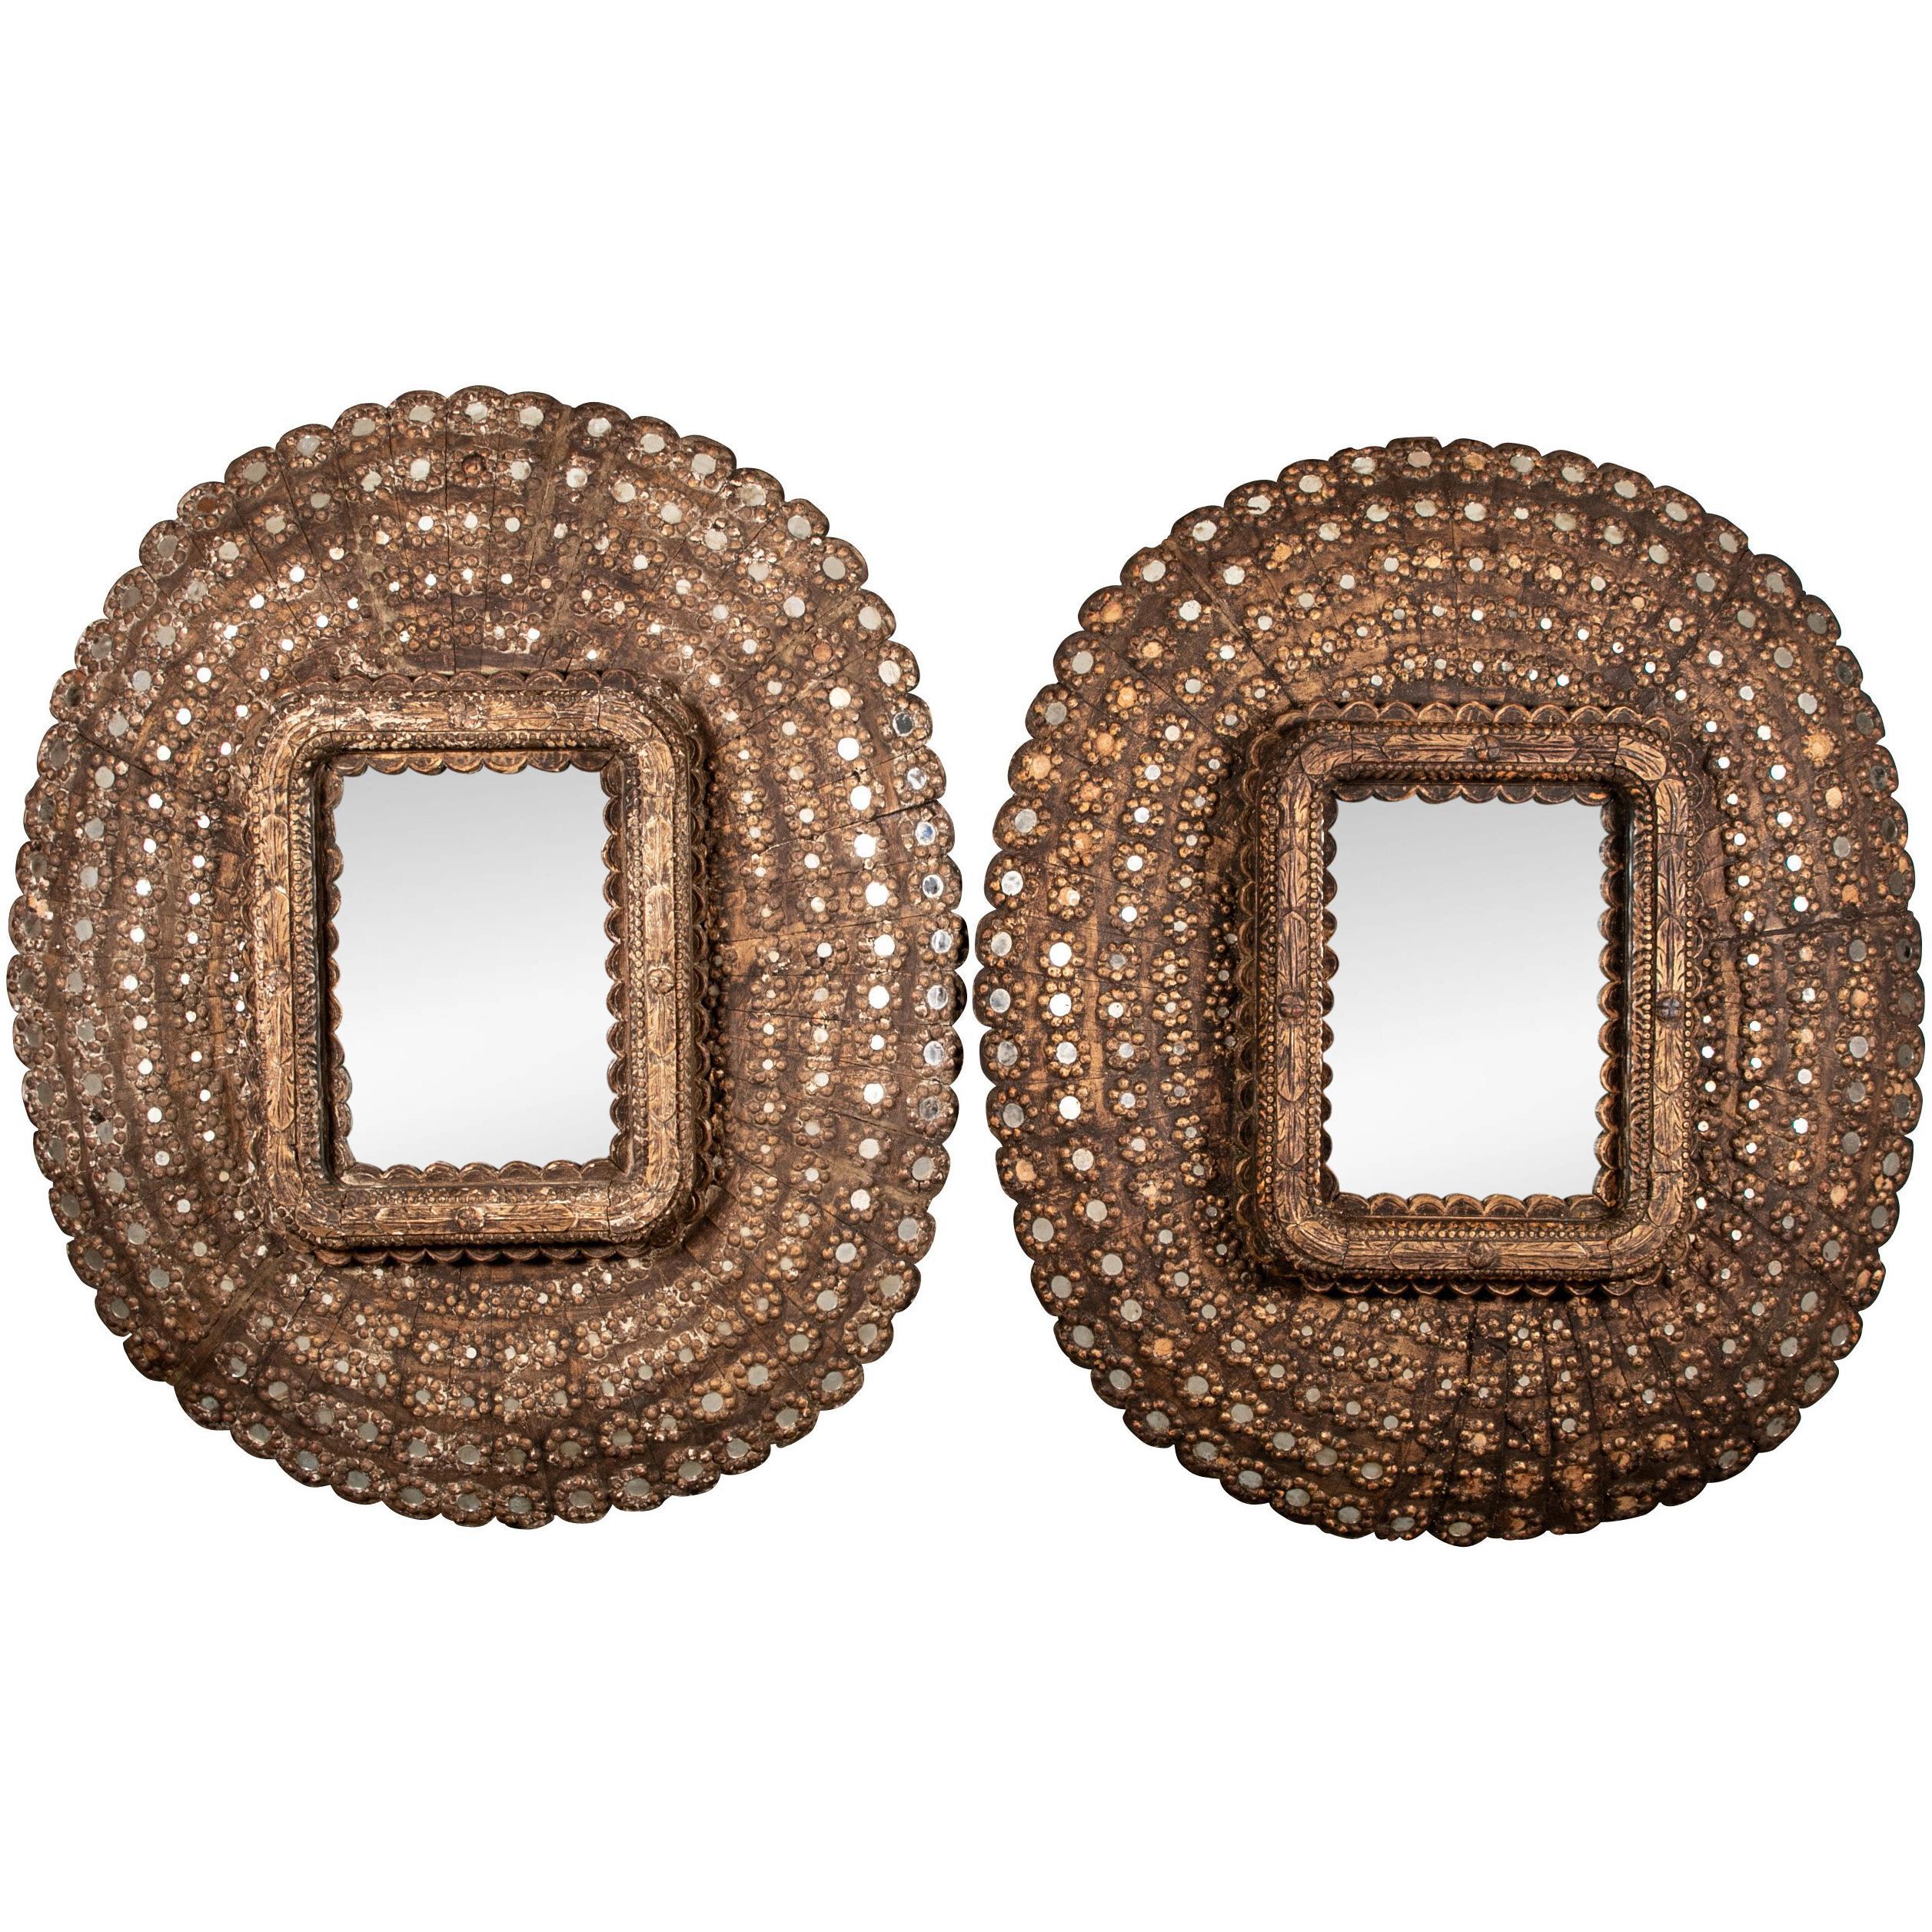 Pair of Oversized Segmented Wall Mirrors